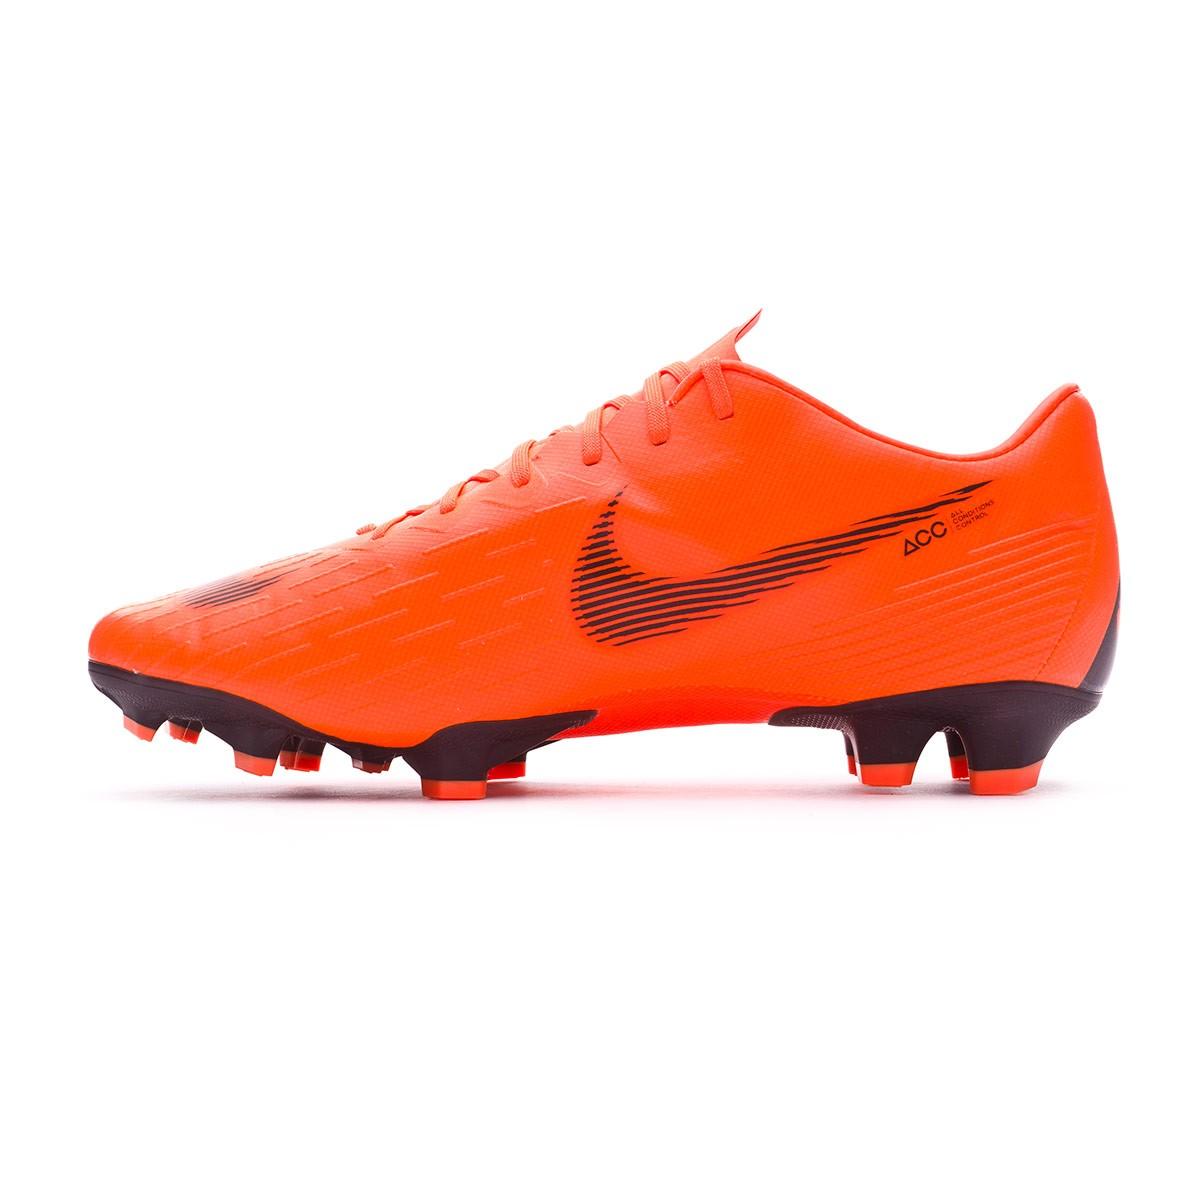 1c53c49abd62a Football Boots Nike Mercurial Vapor XII Pro FG Total orange-Black-Volt -  Football store Fútbol Emotion